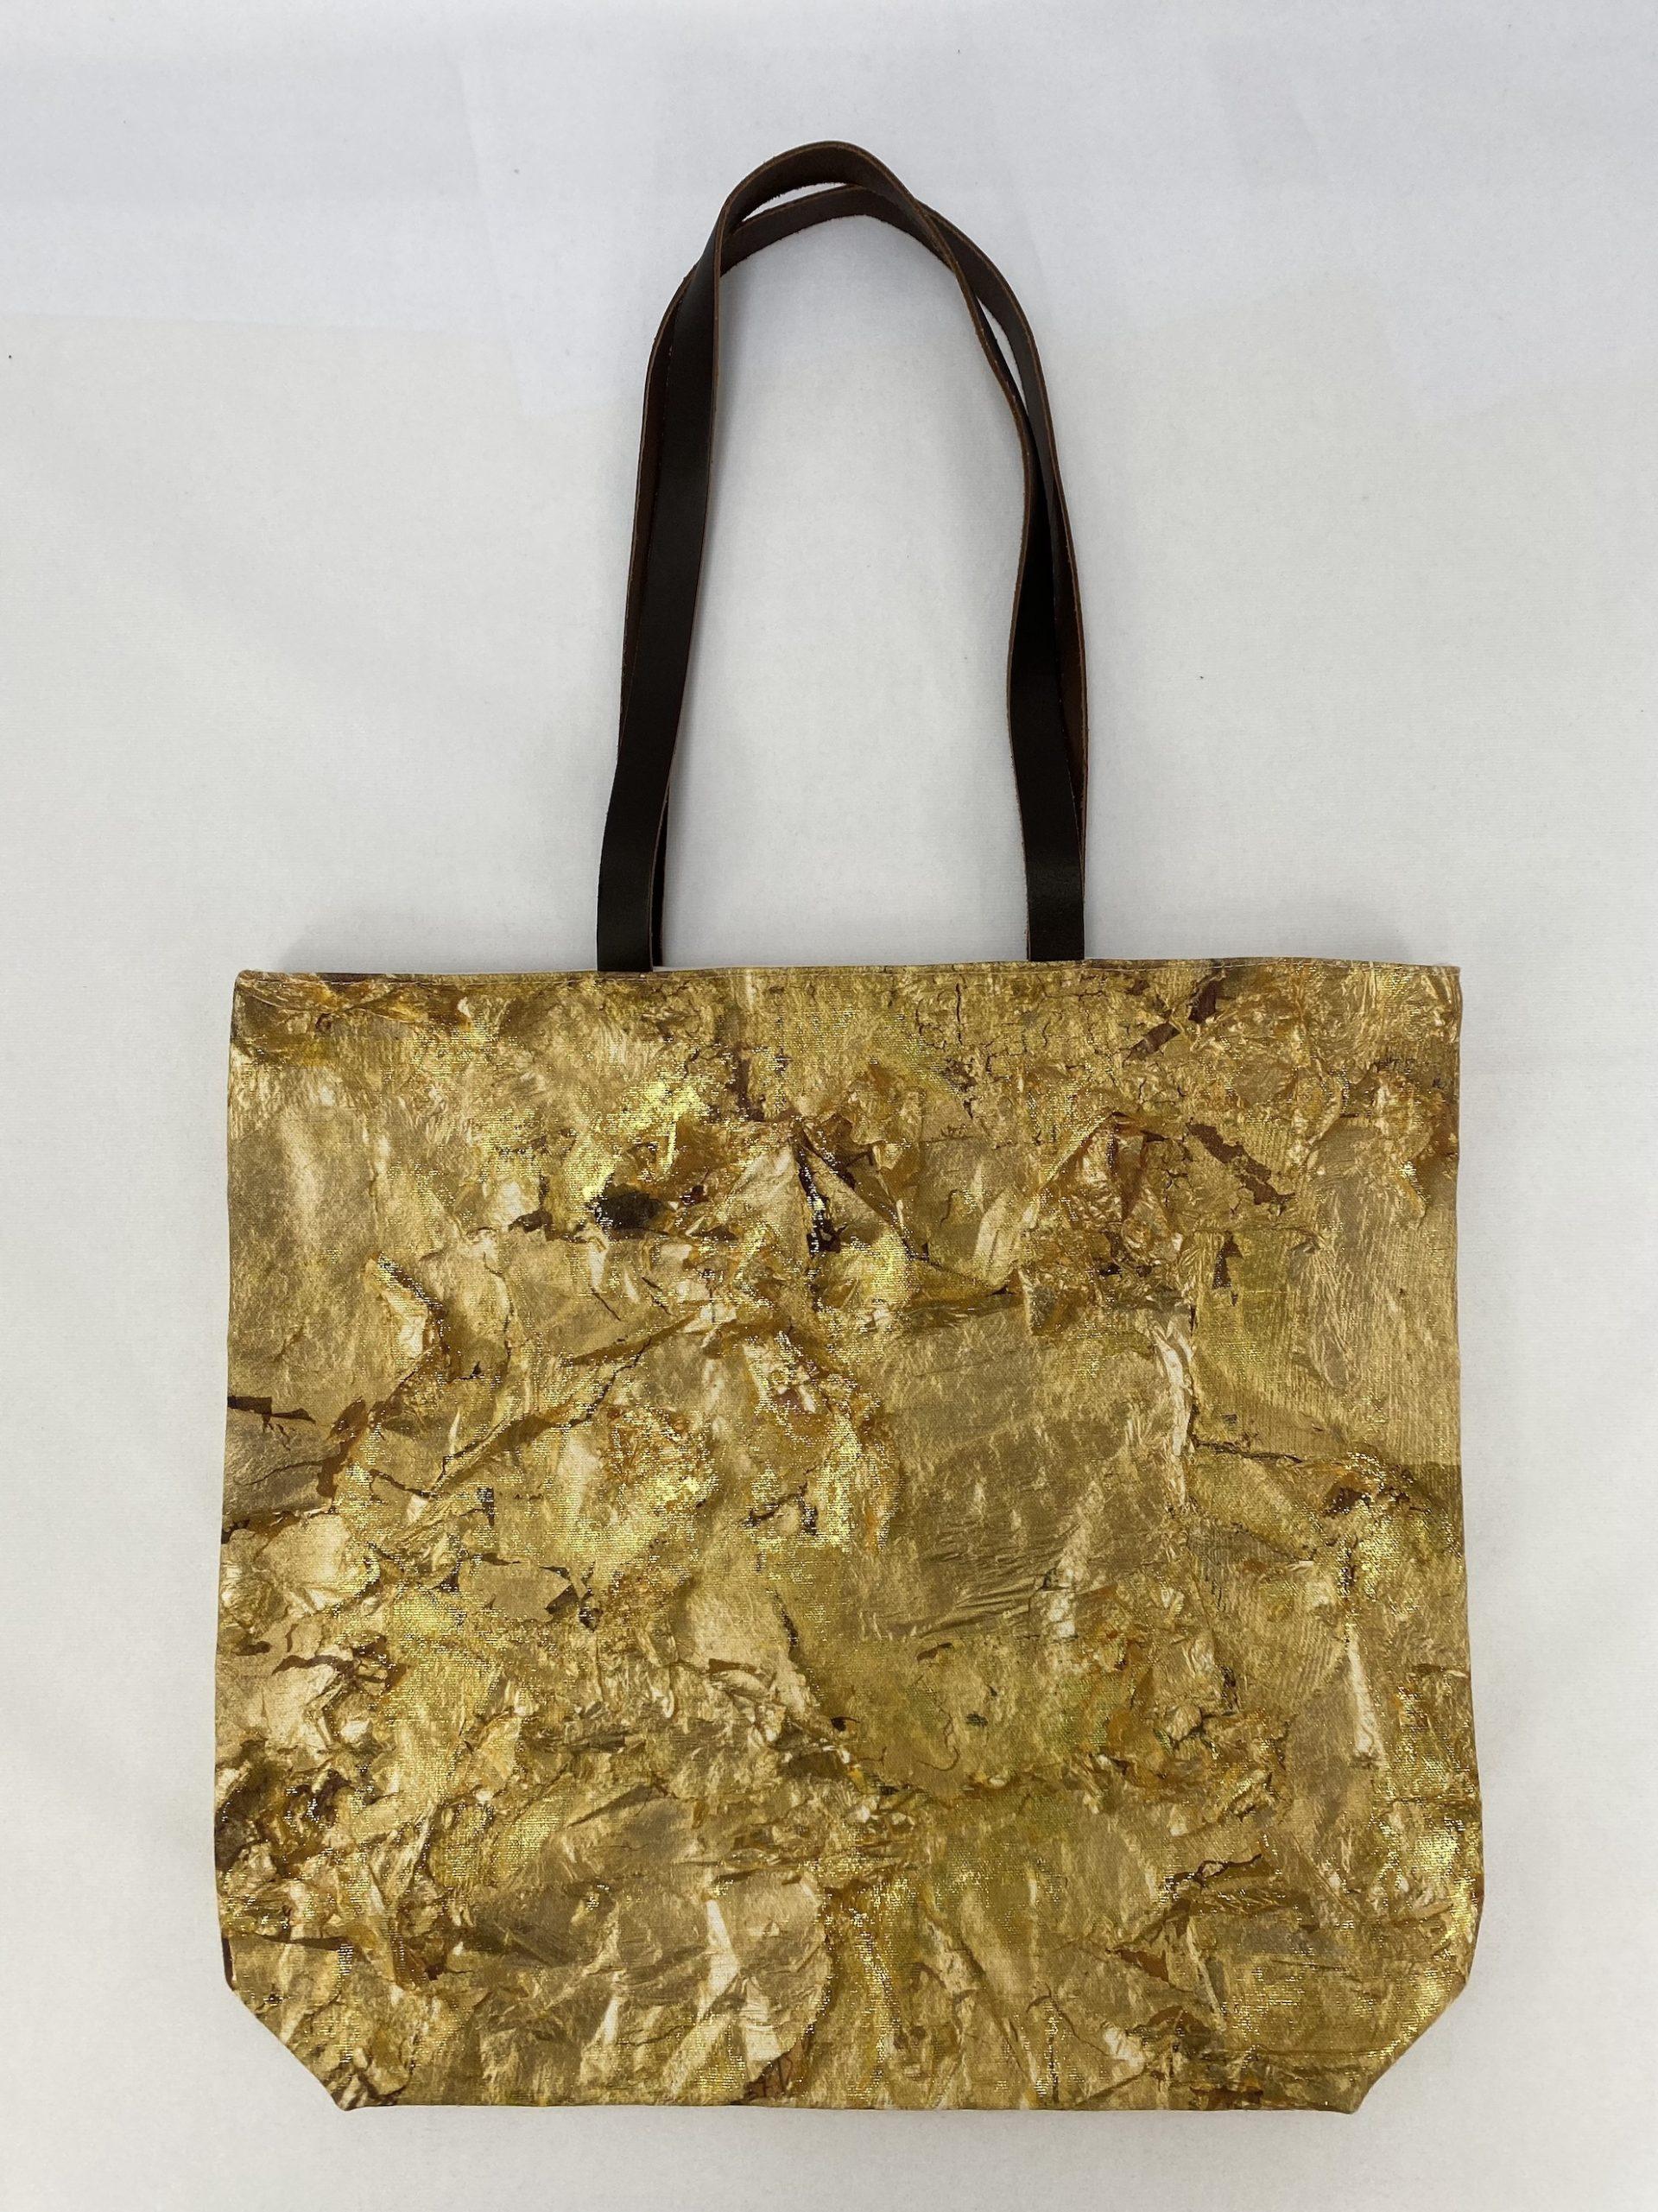 Paul Bristow's innovative gold foil printing onto a digitally printed tote bag